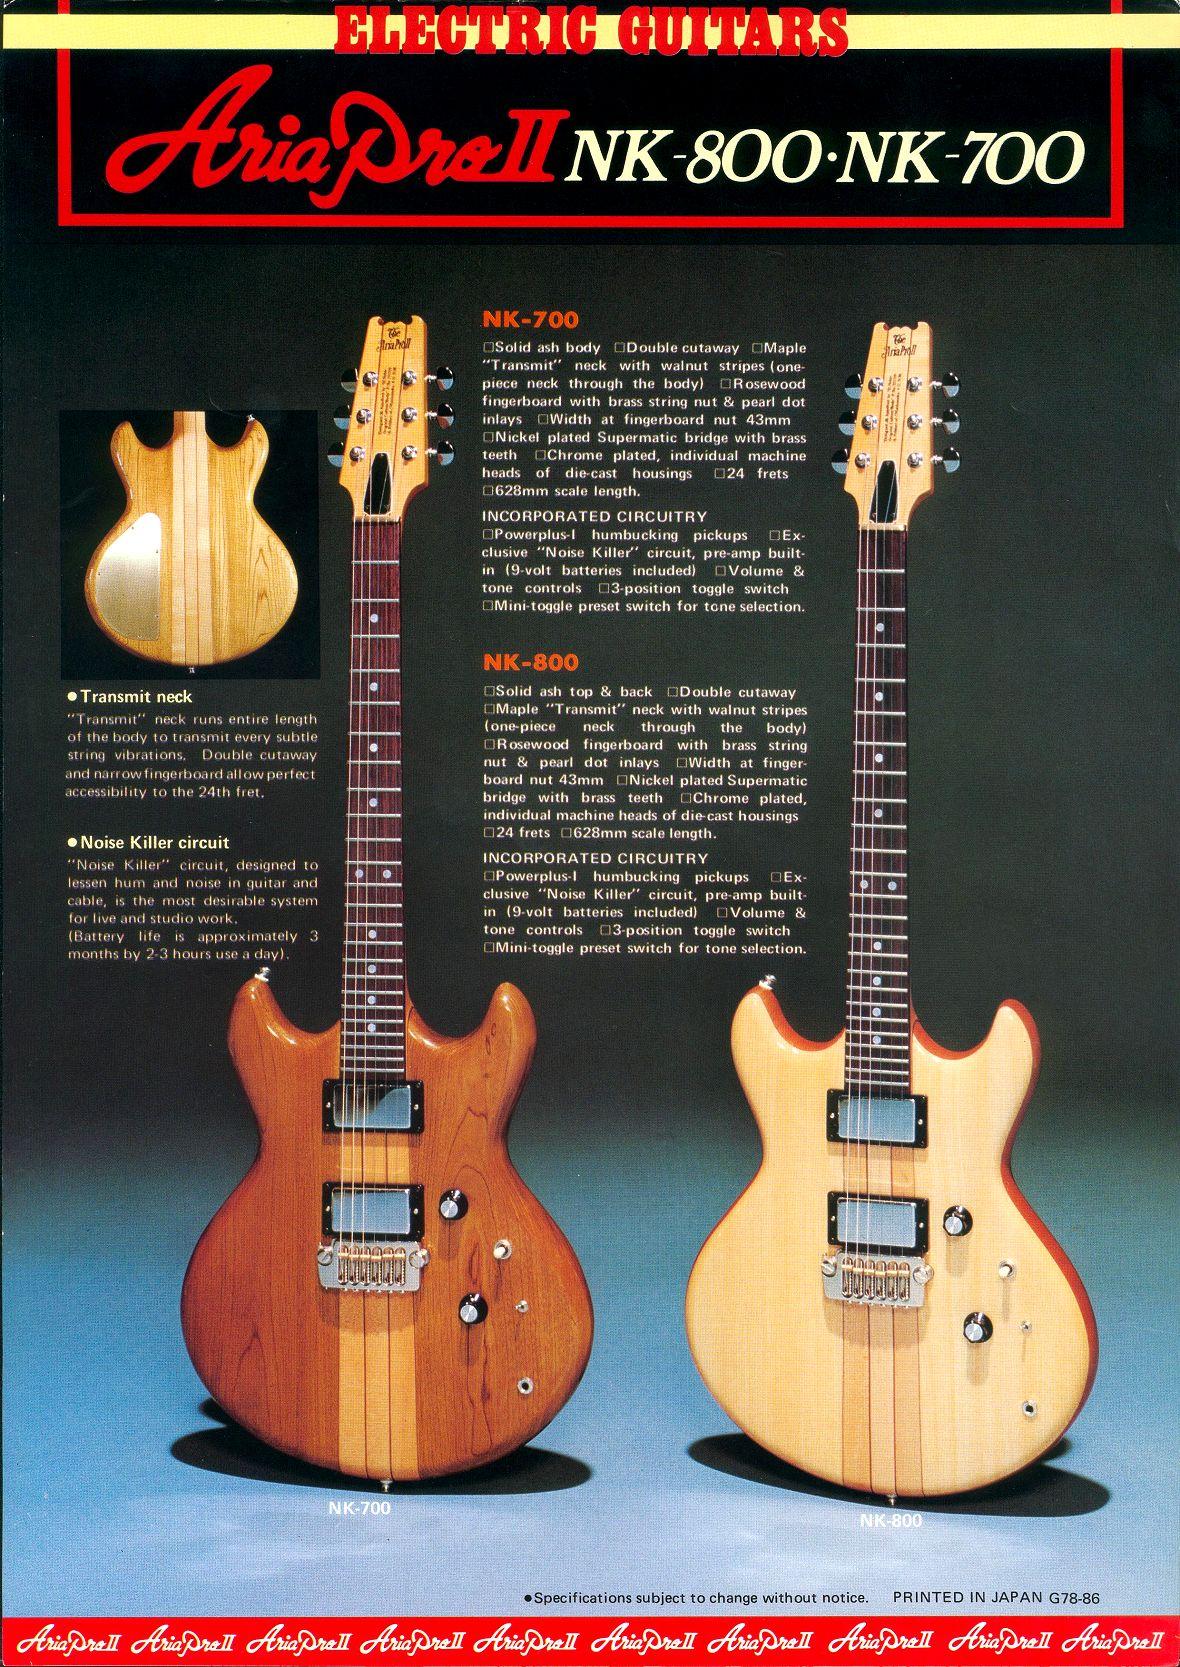 1978 nk700-800 slick pg1